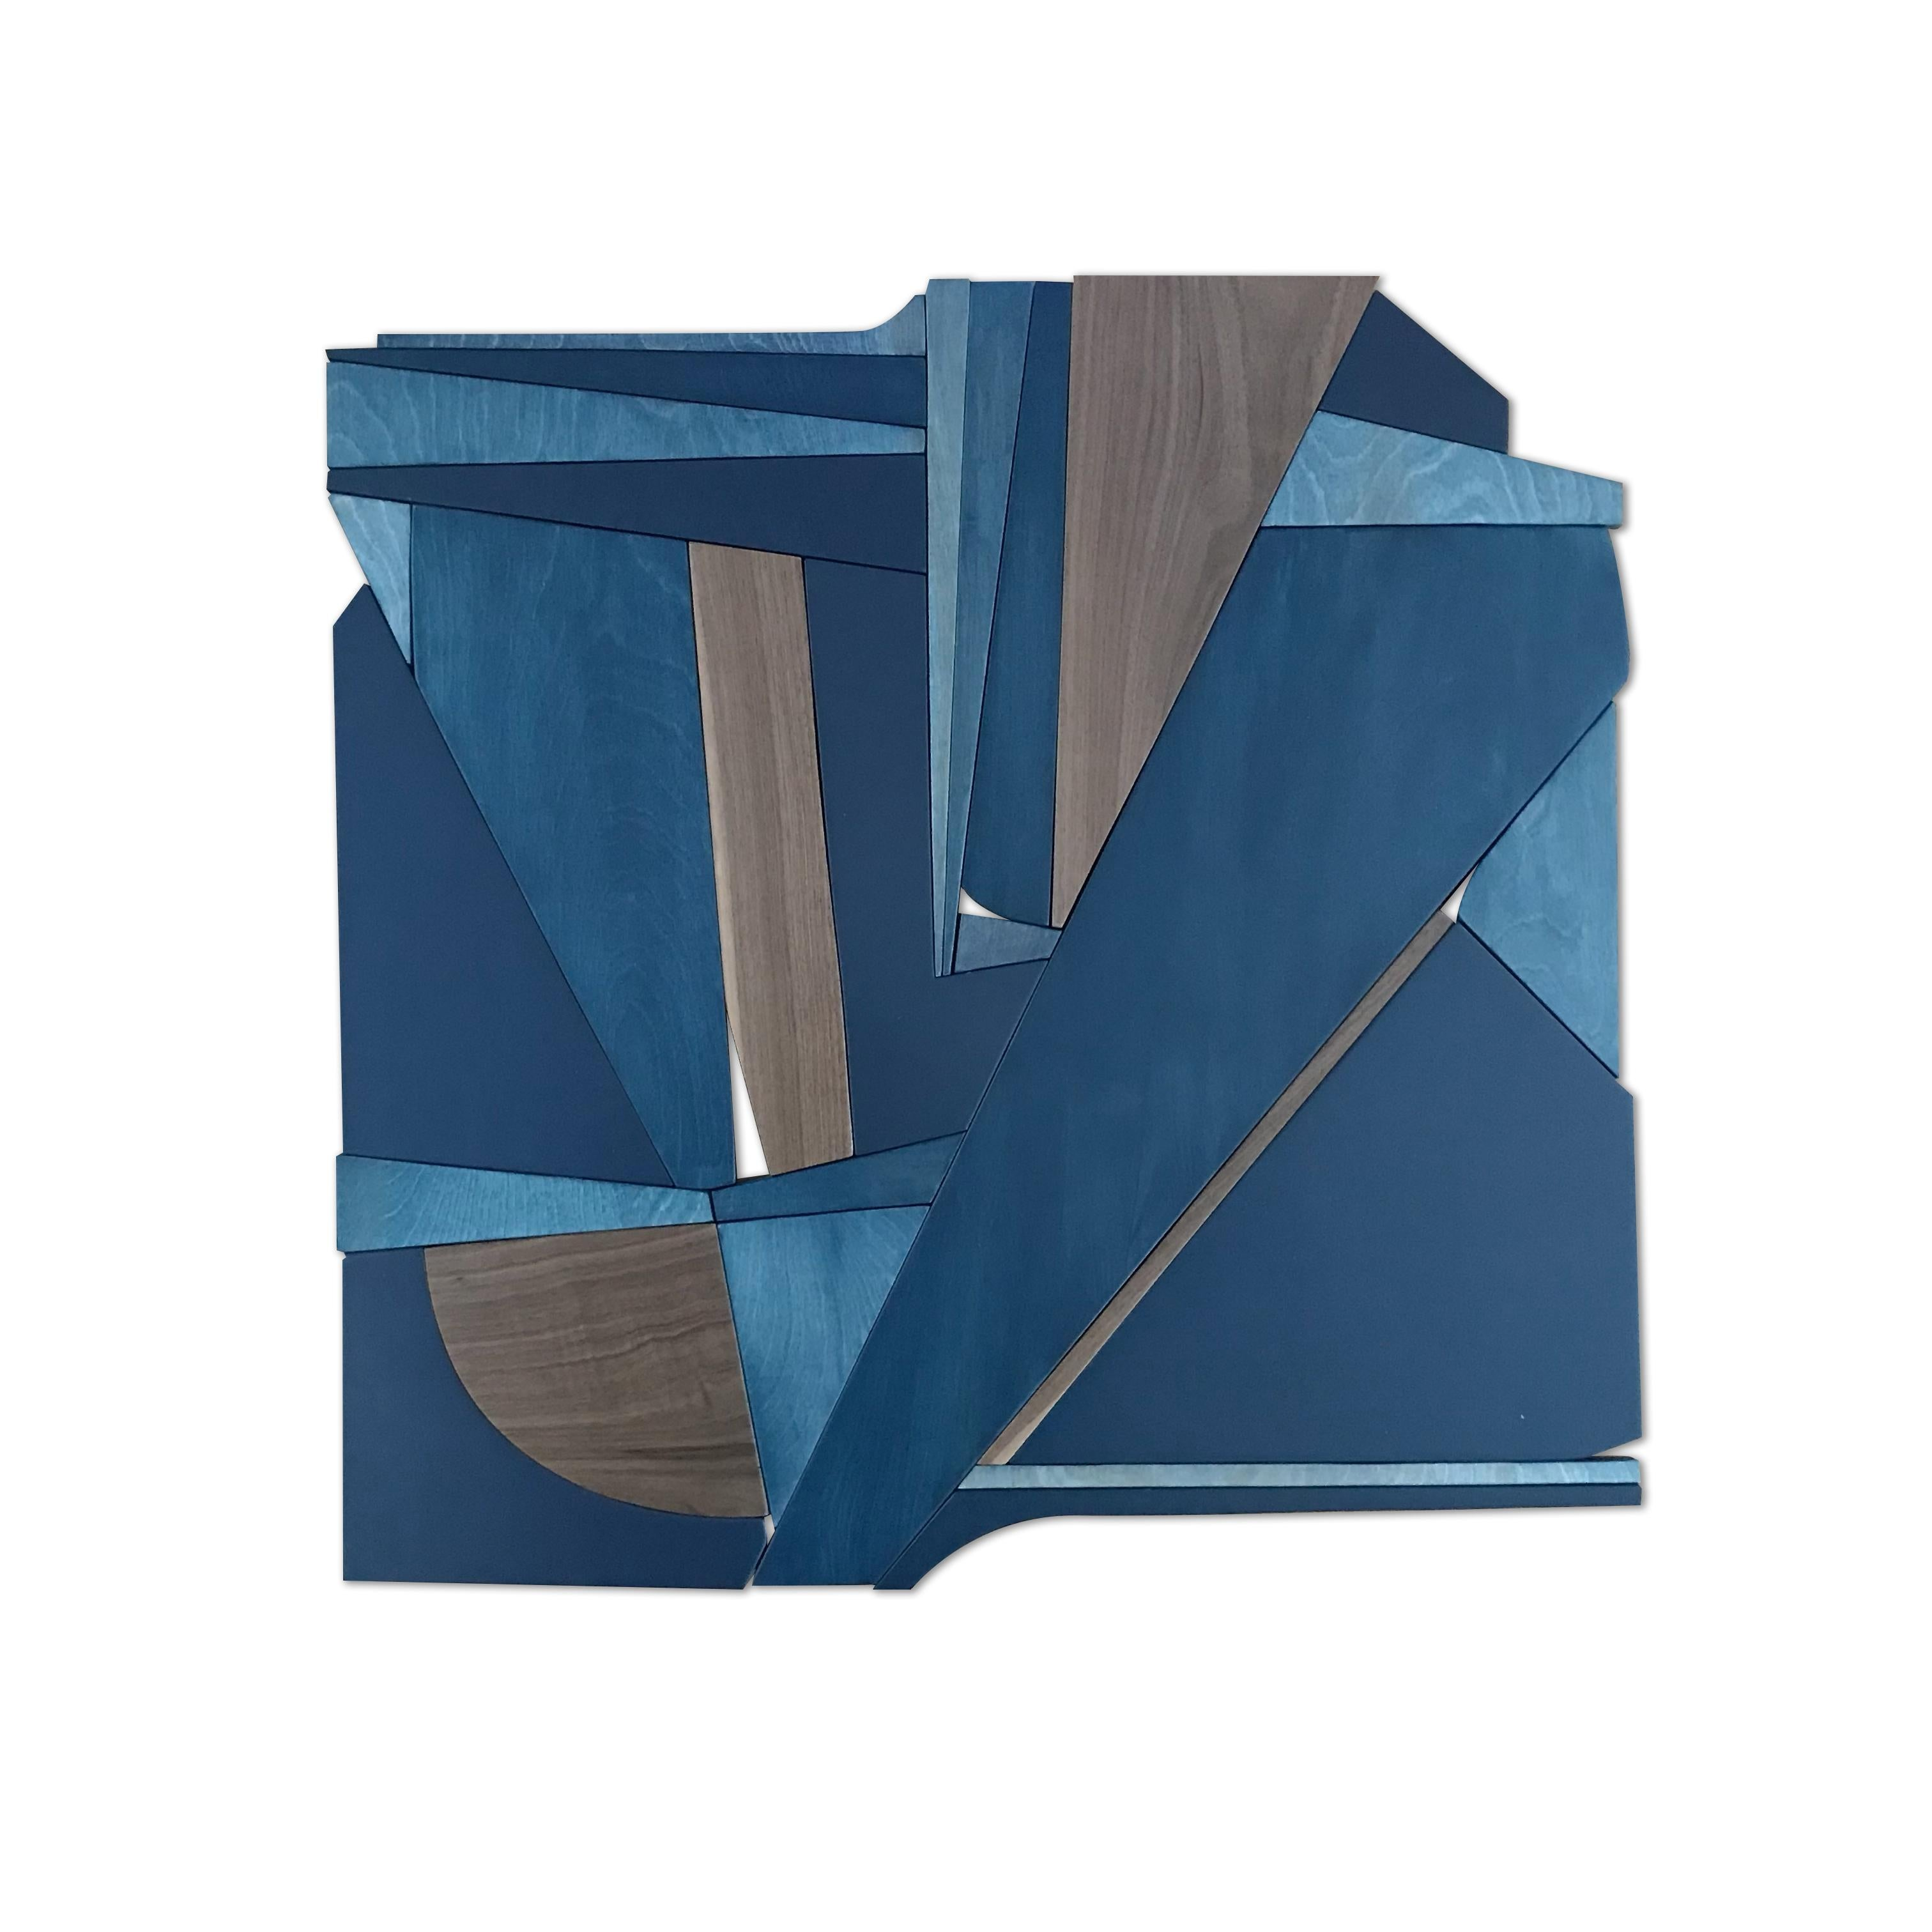 Denim Blue II (modern abstract wall sculpture minimal monochrome art deco wood)